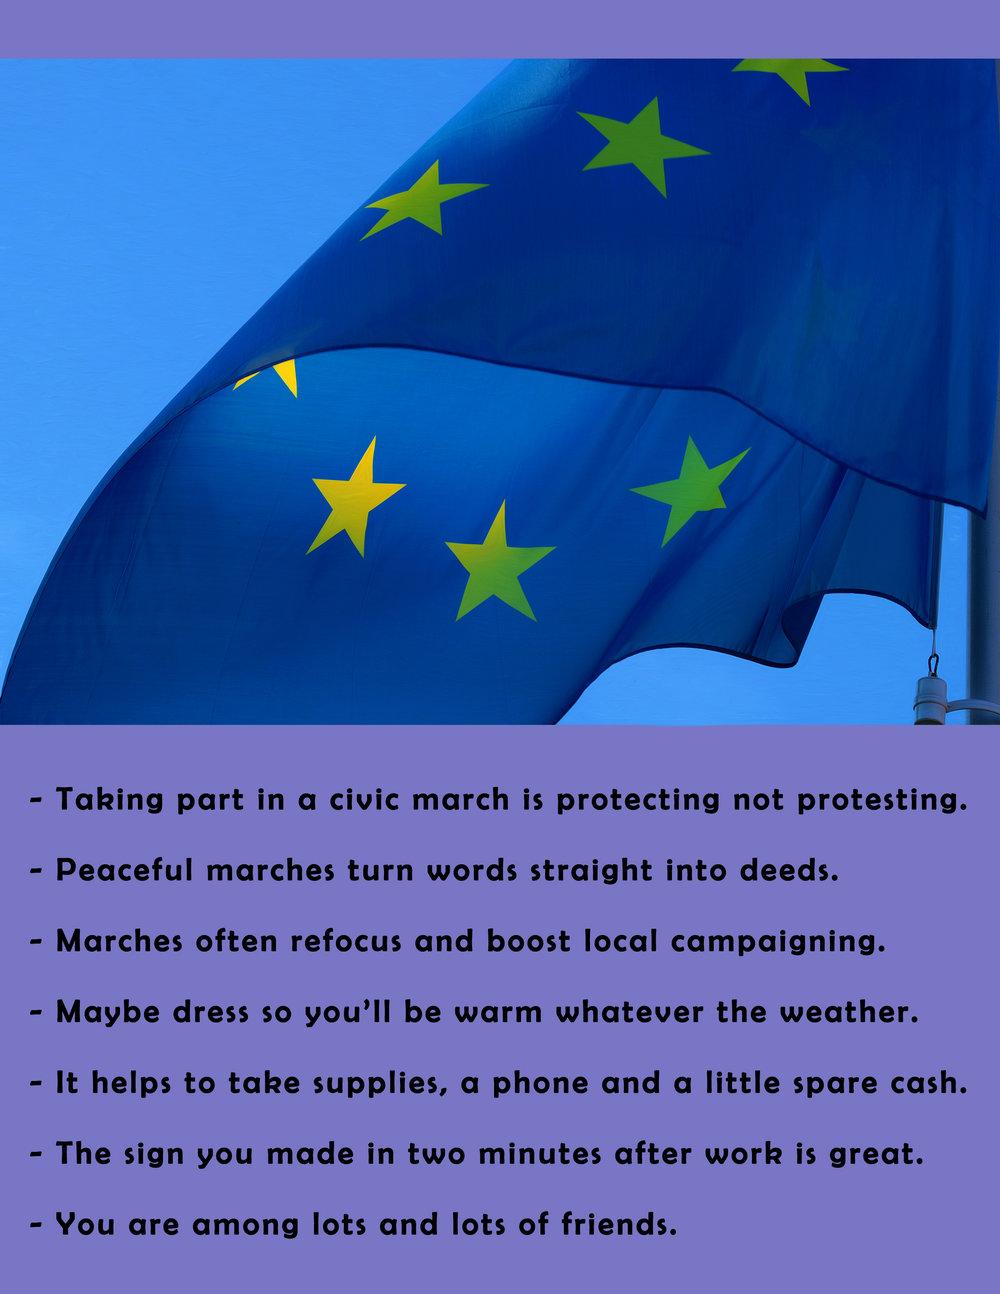 EU2scottishmedialabr.jpg